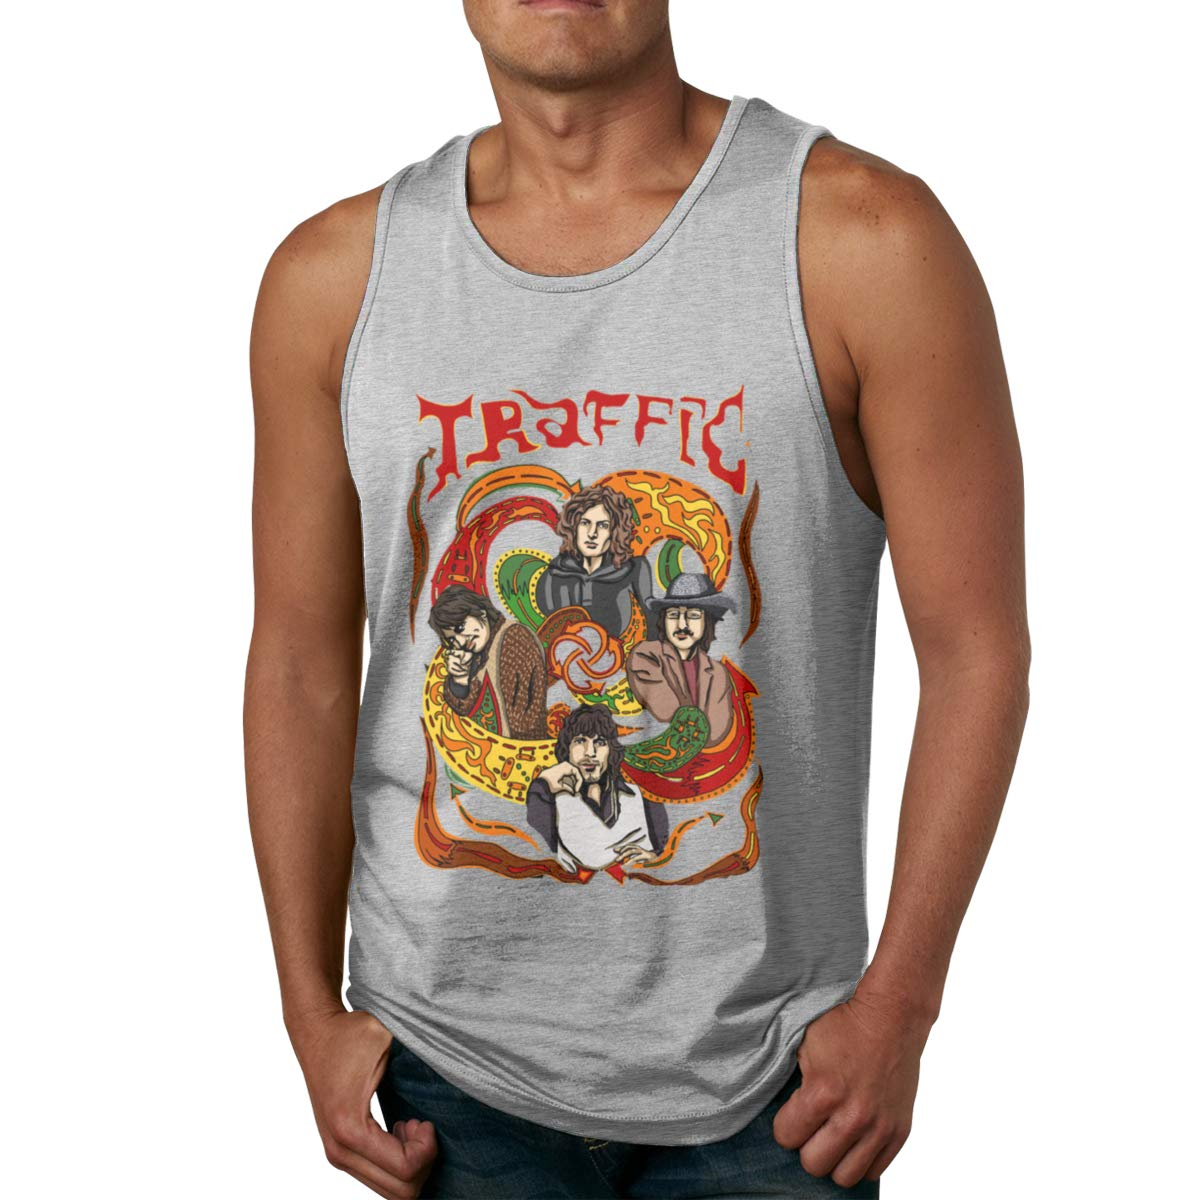 Seuriamin Traffic Band Humor Outdoor Sleeveless Tank Top T Shirt